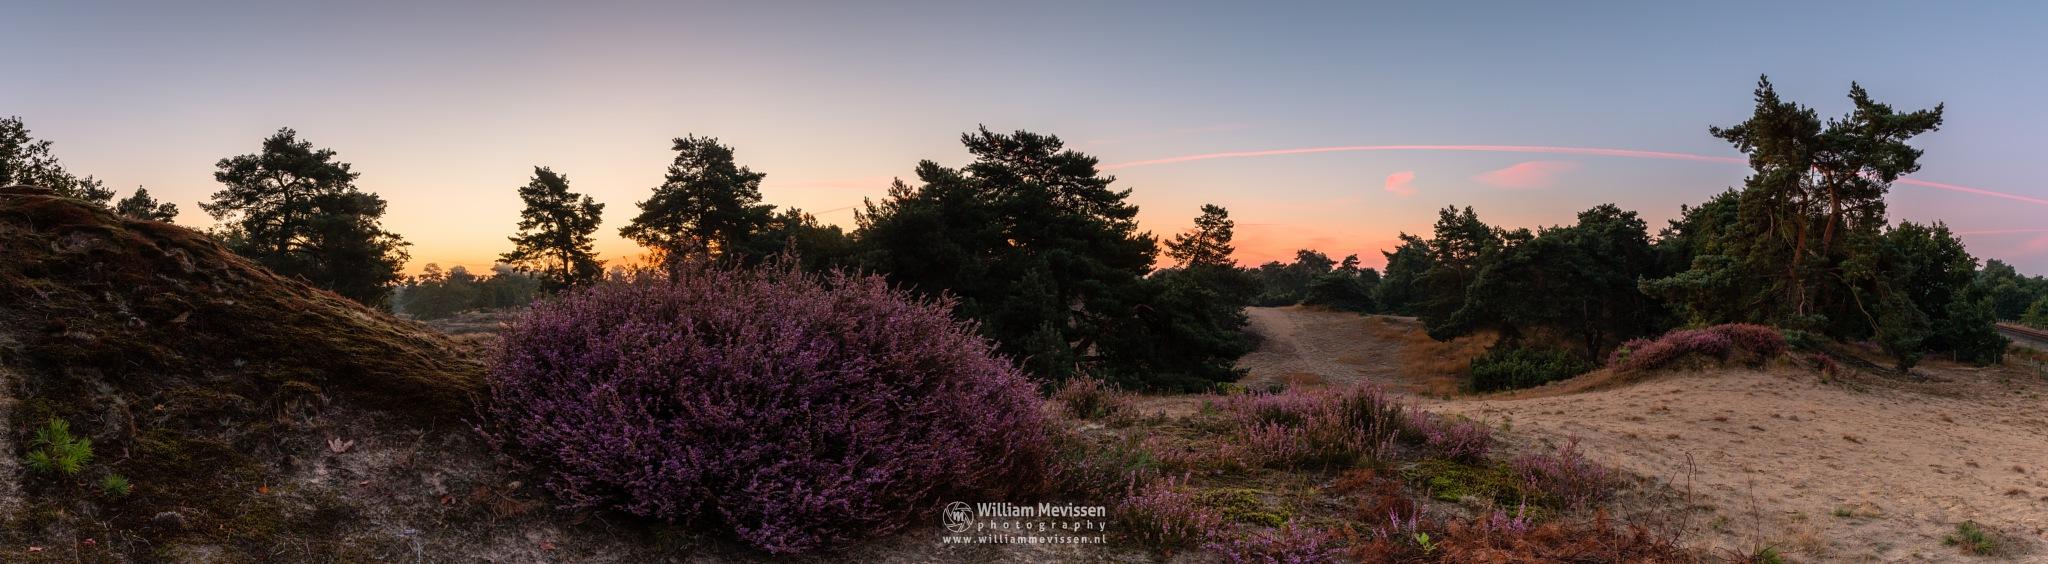 Panorama - Heather Twilight View by William Mevissen